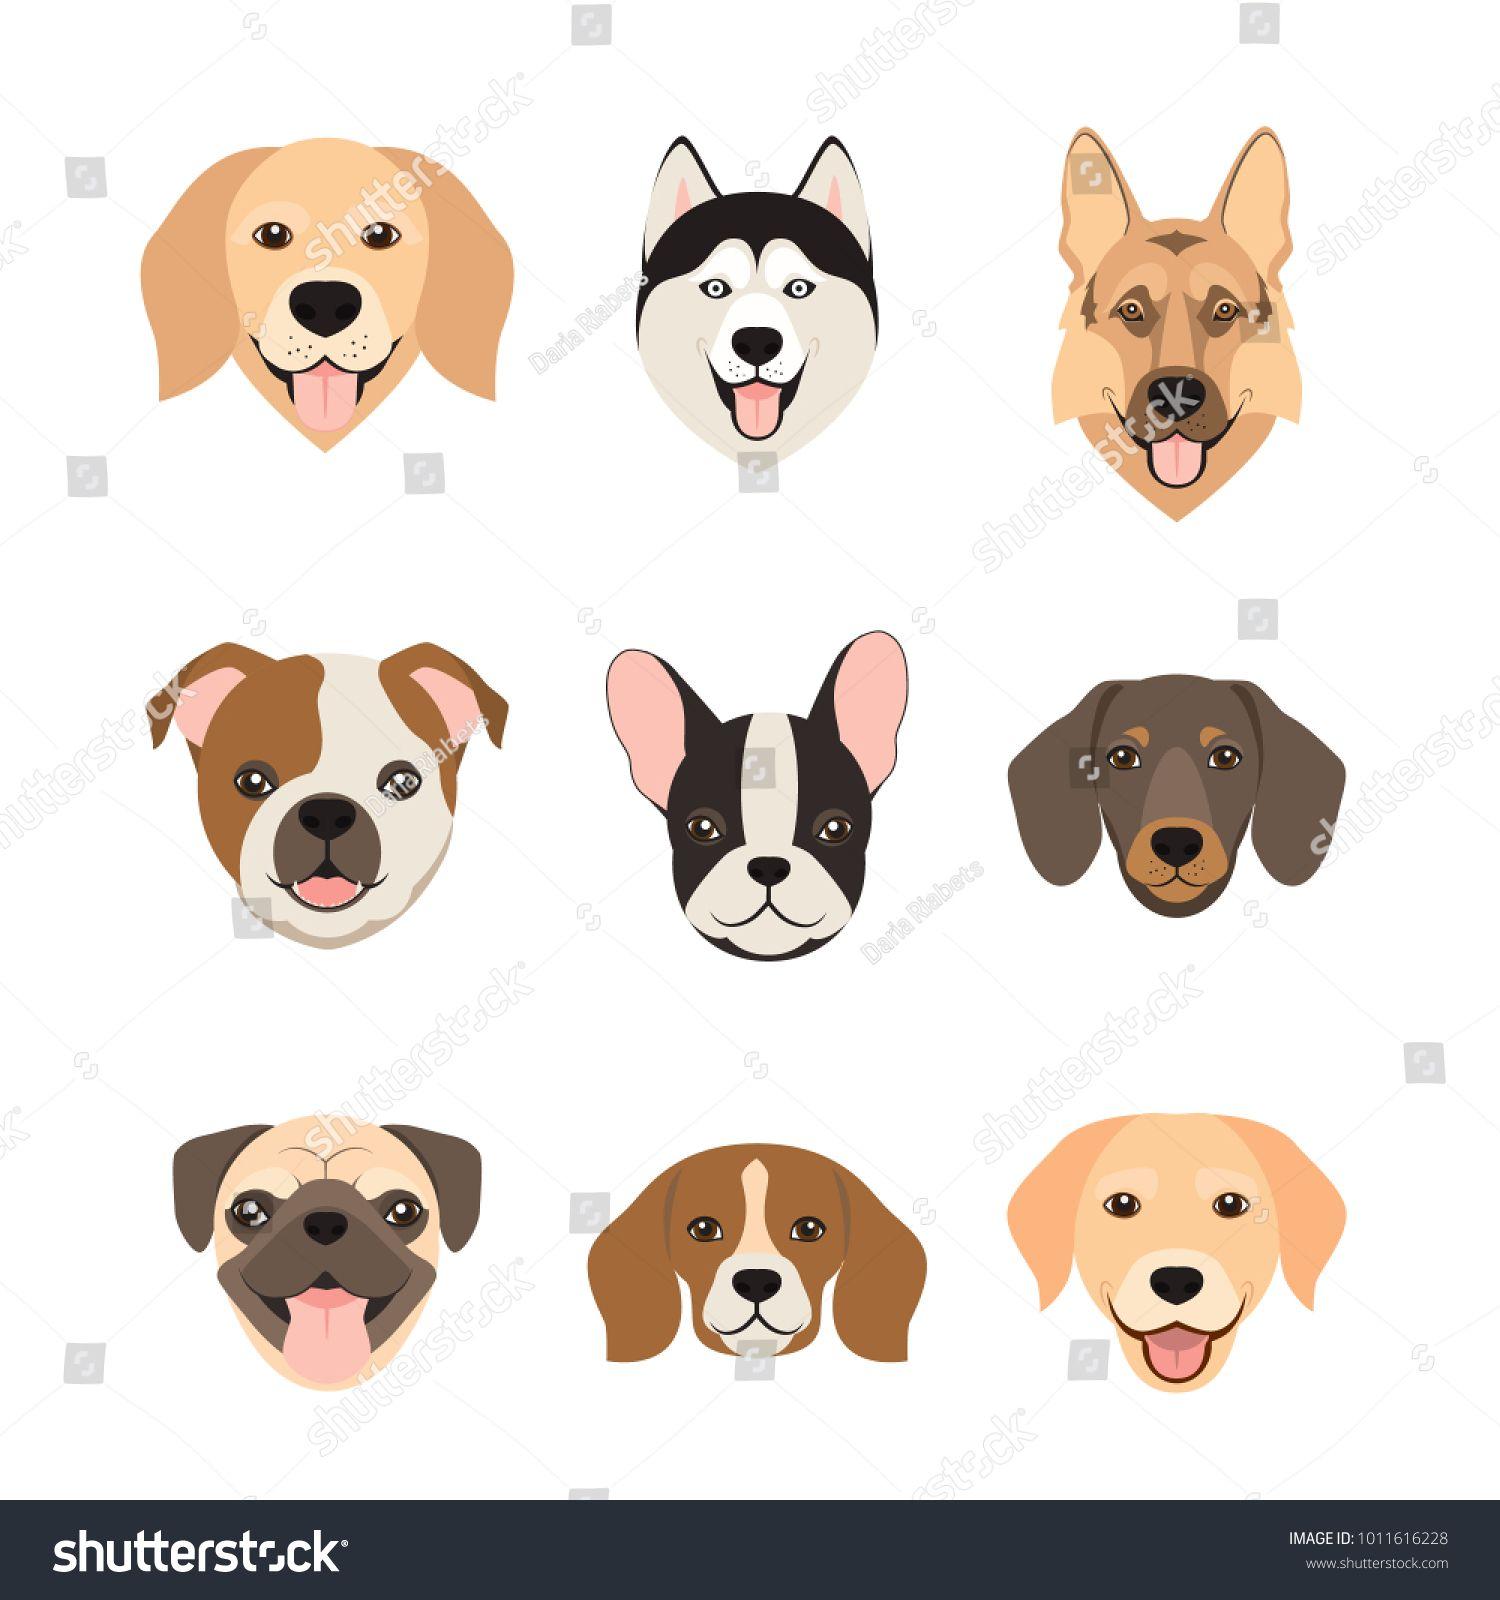 Flat Style Dog Head Icons Cartoon Dogs Faces Set Vector Illustration Isolated On Whitehead I Dog Icon Animal Illustration Photographer Business Card Template